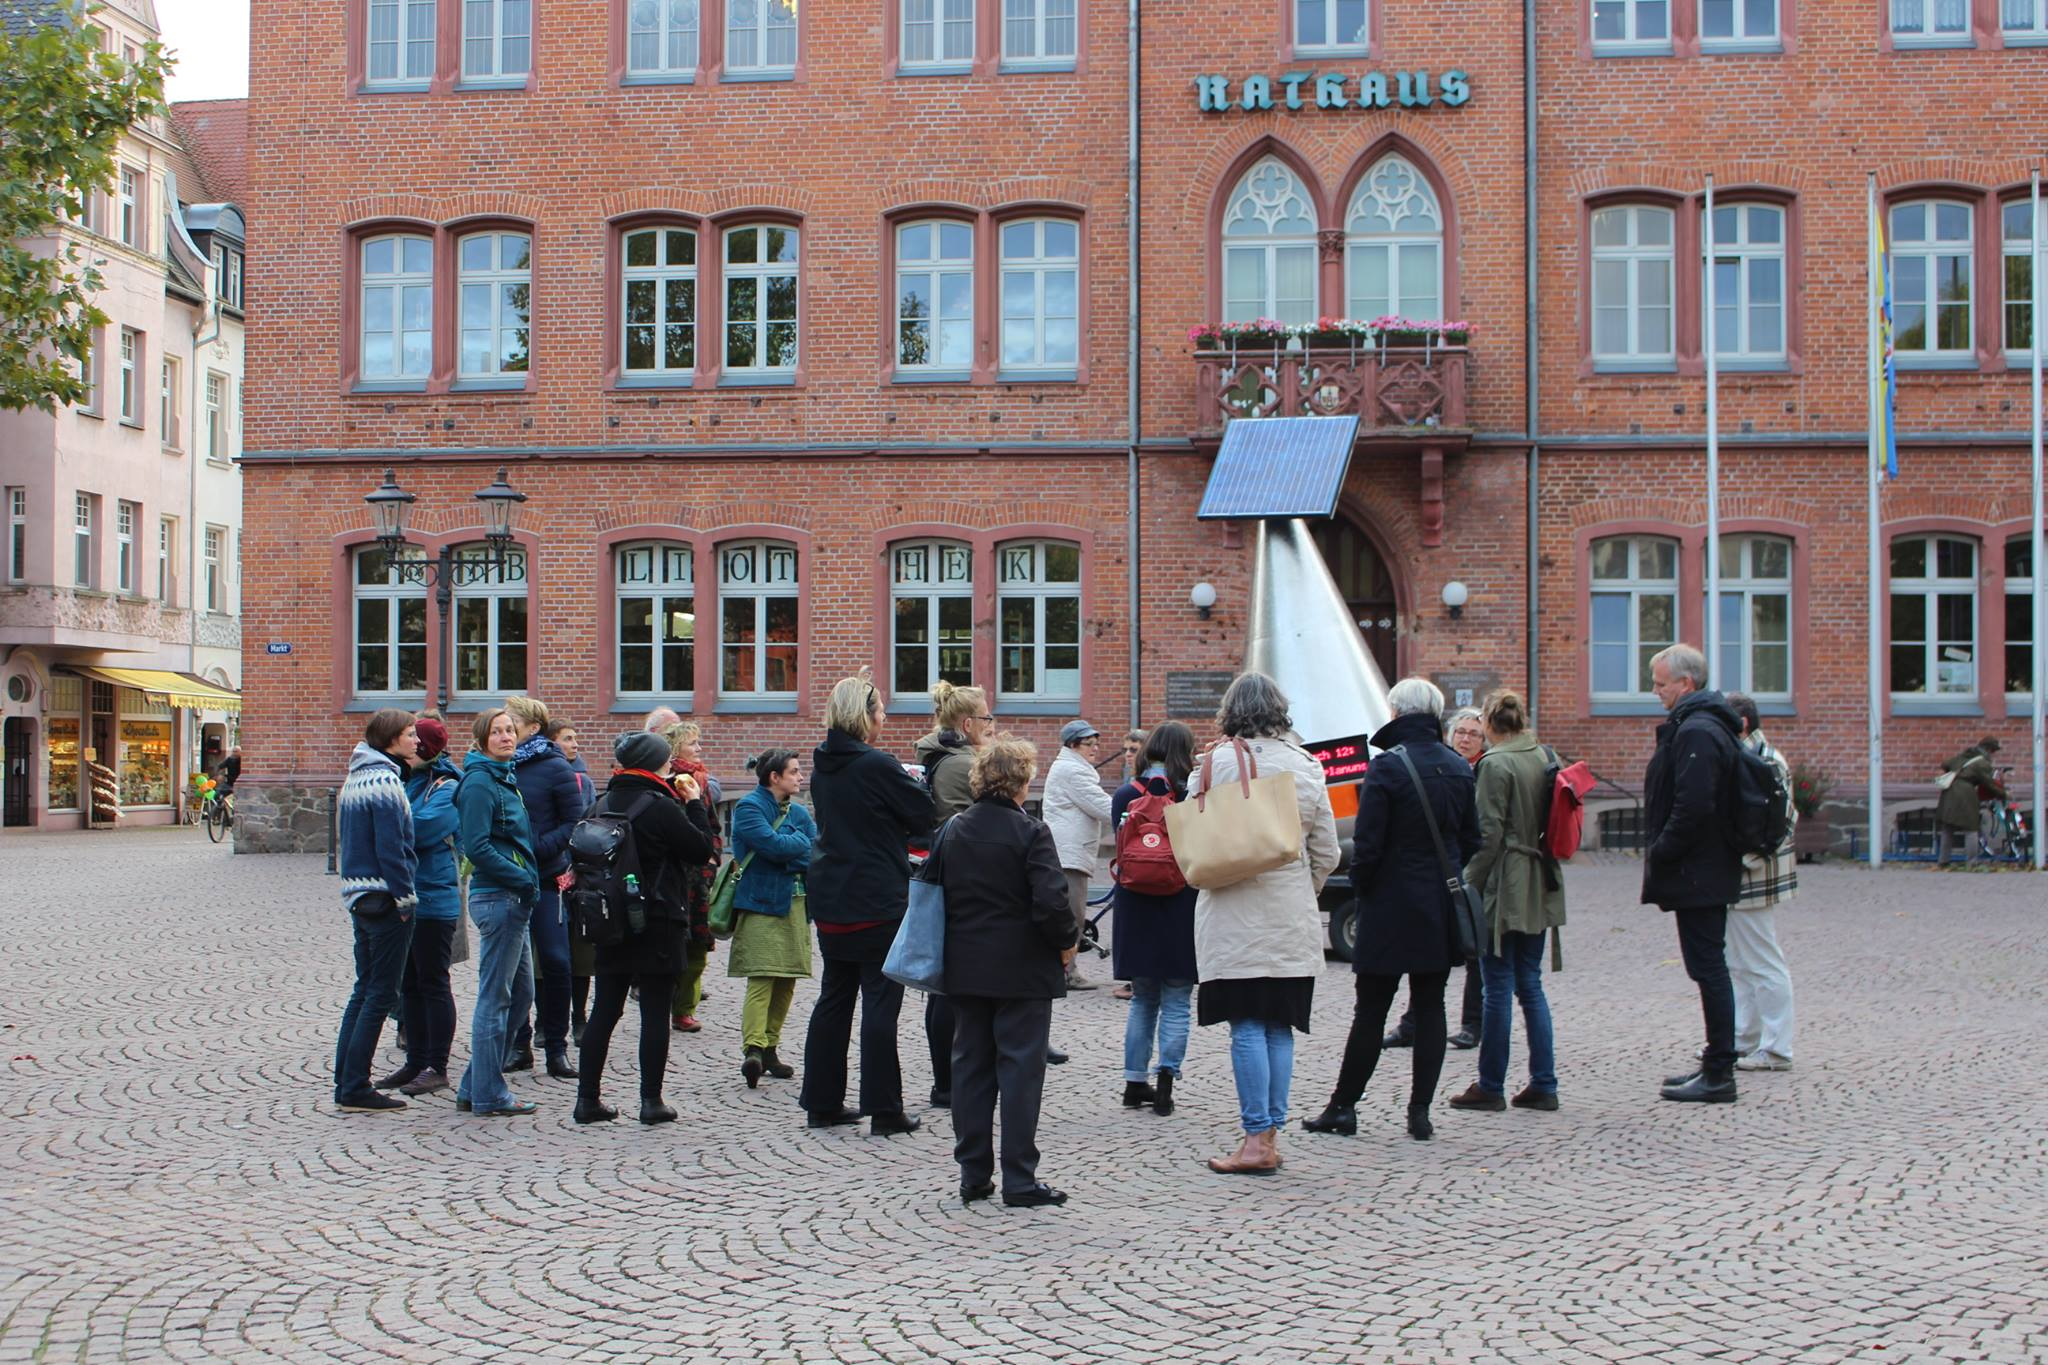 Wanderboje auf dem Marktplatz